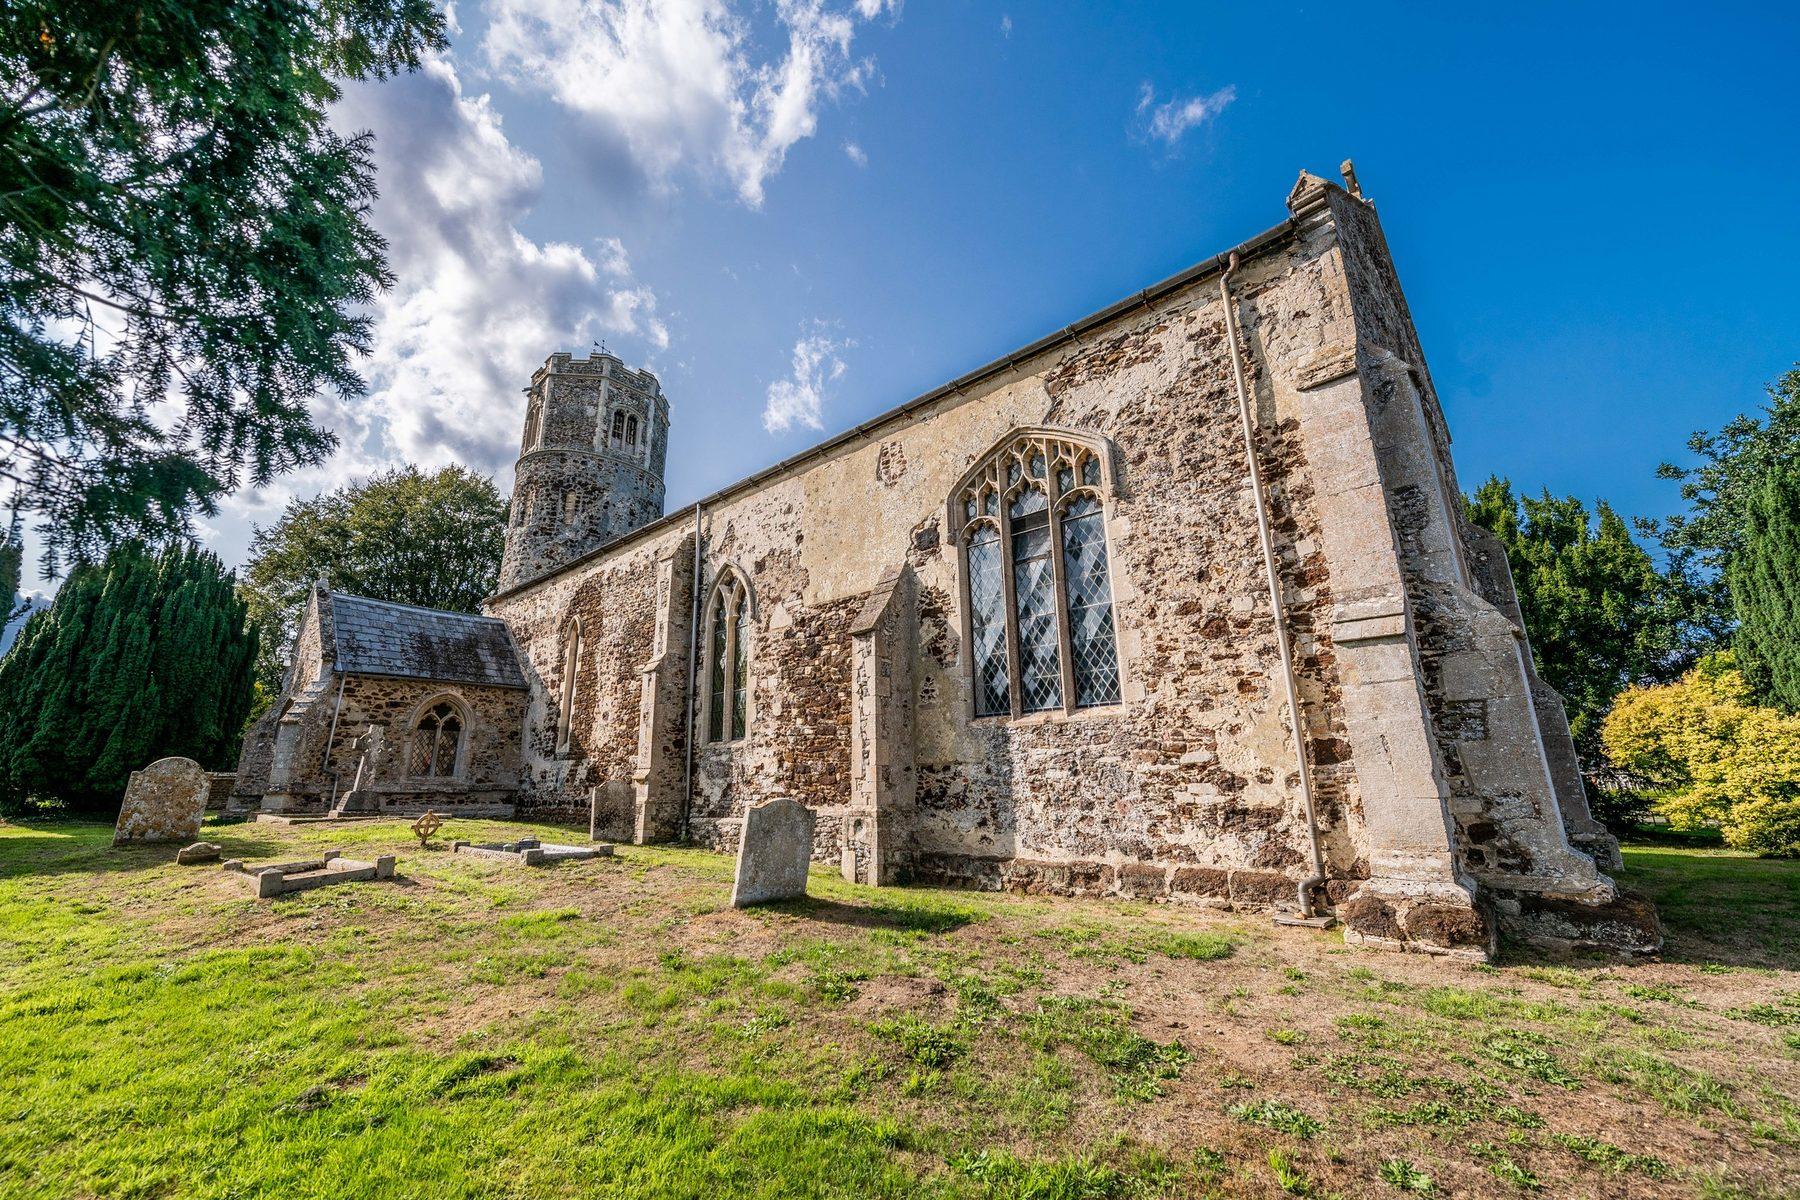 005 Bexwell Church 2018